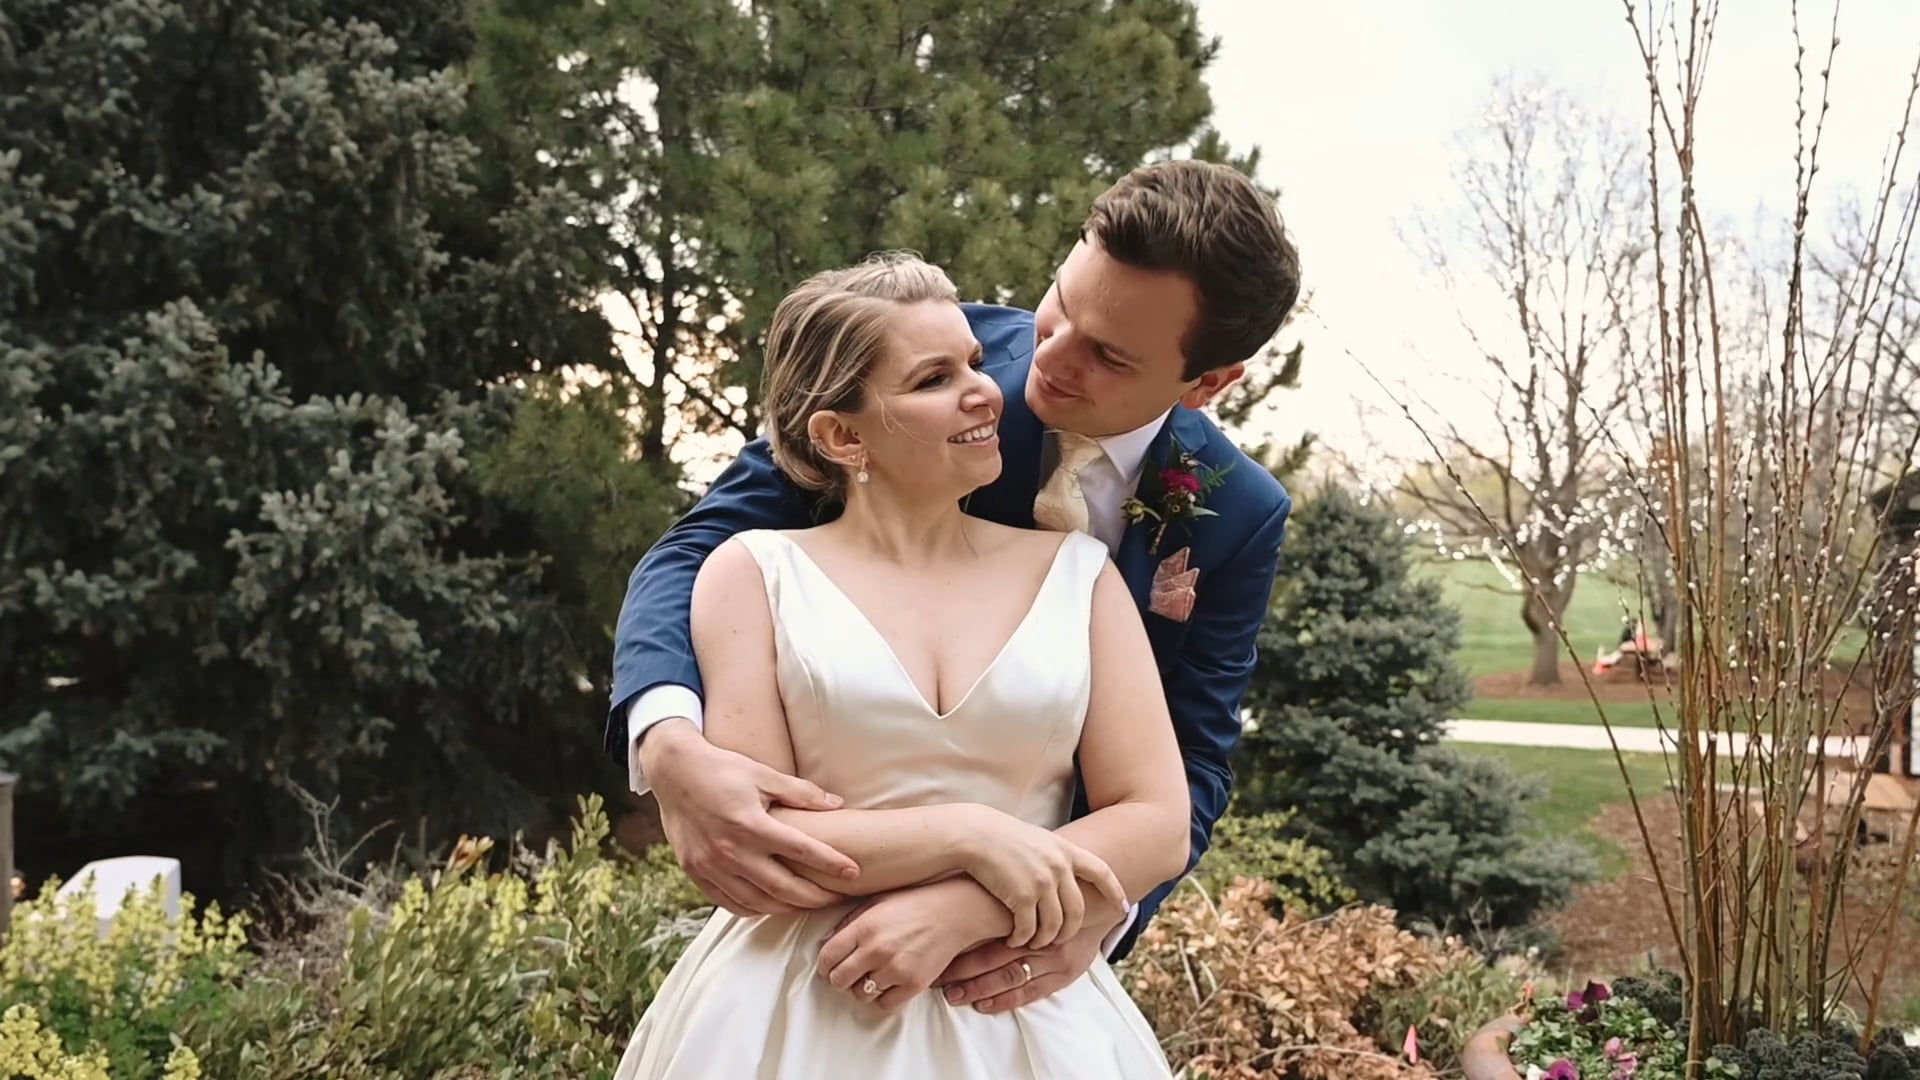 Denver Botanic Gardens Wedding - Laura & David